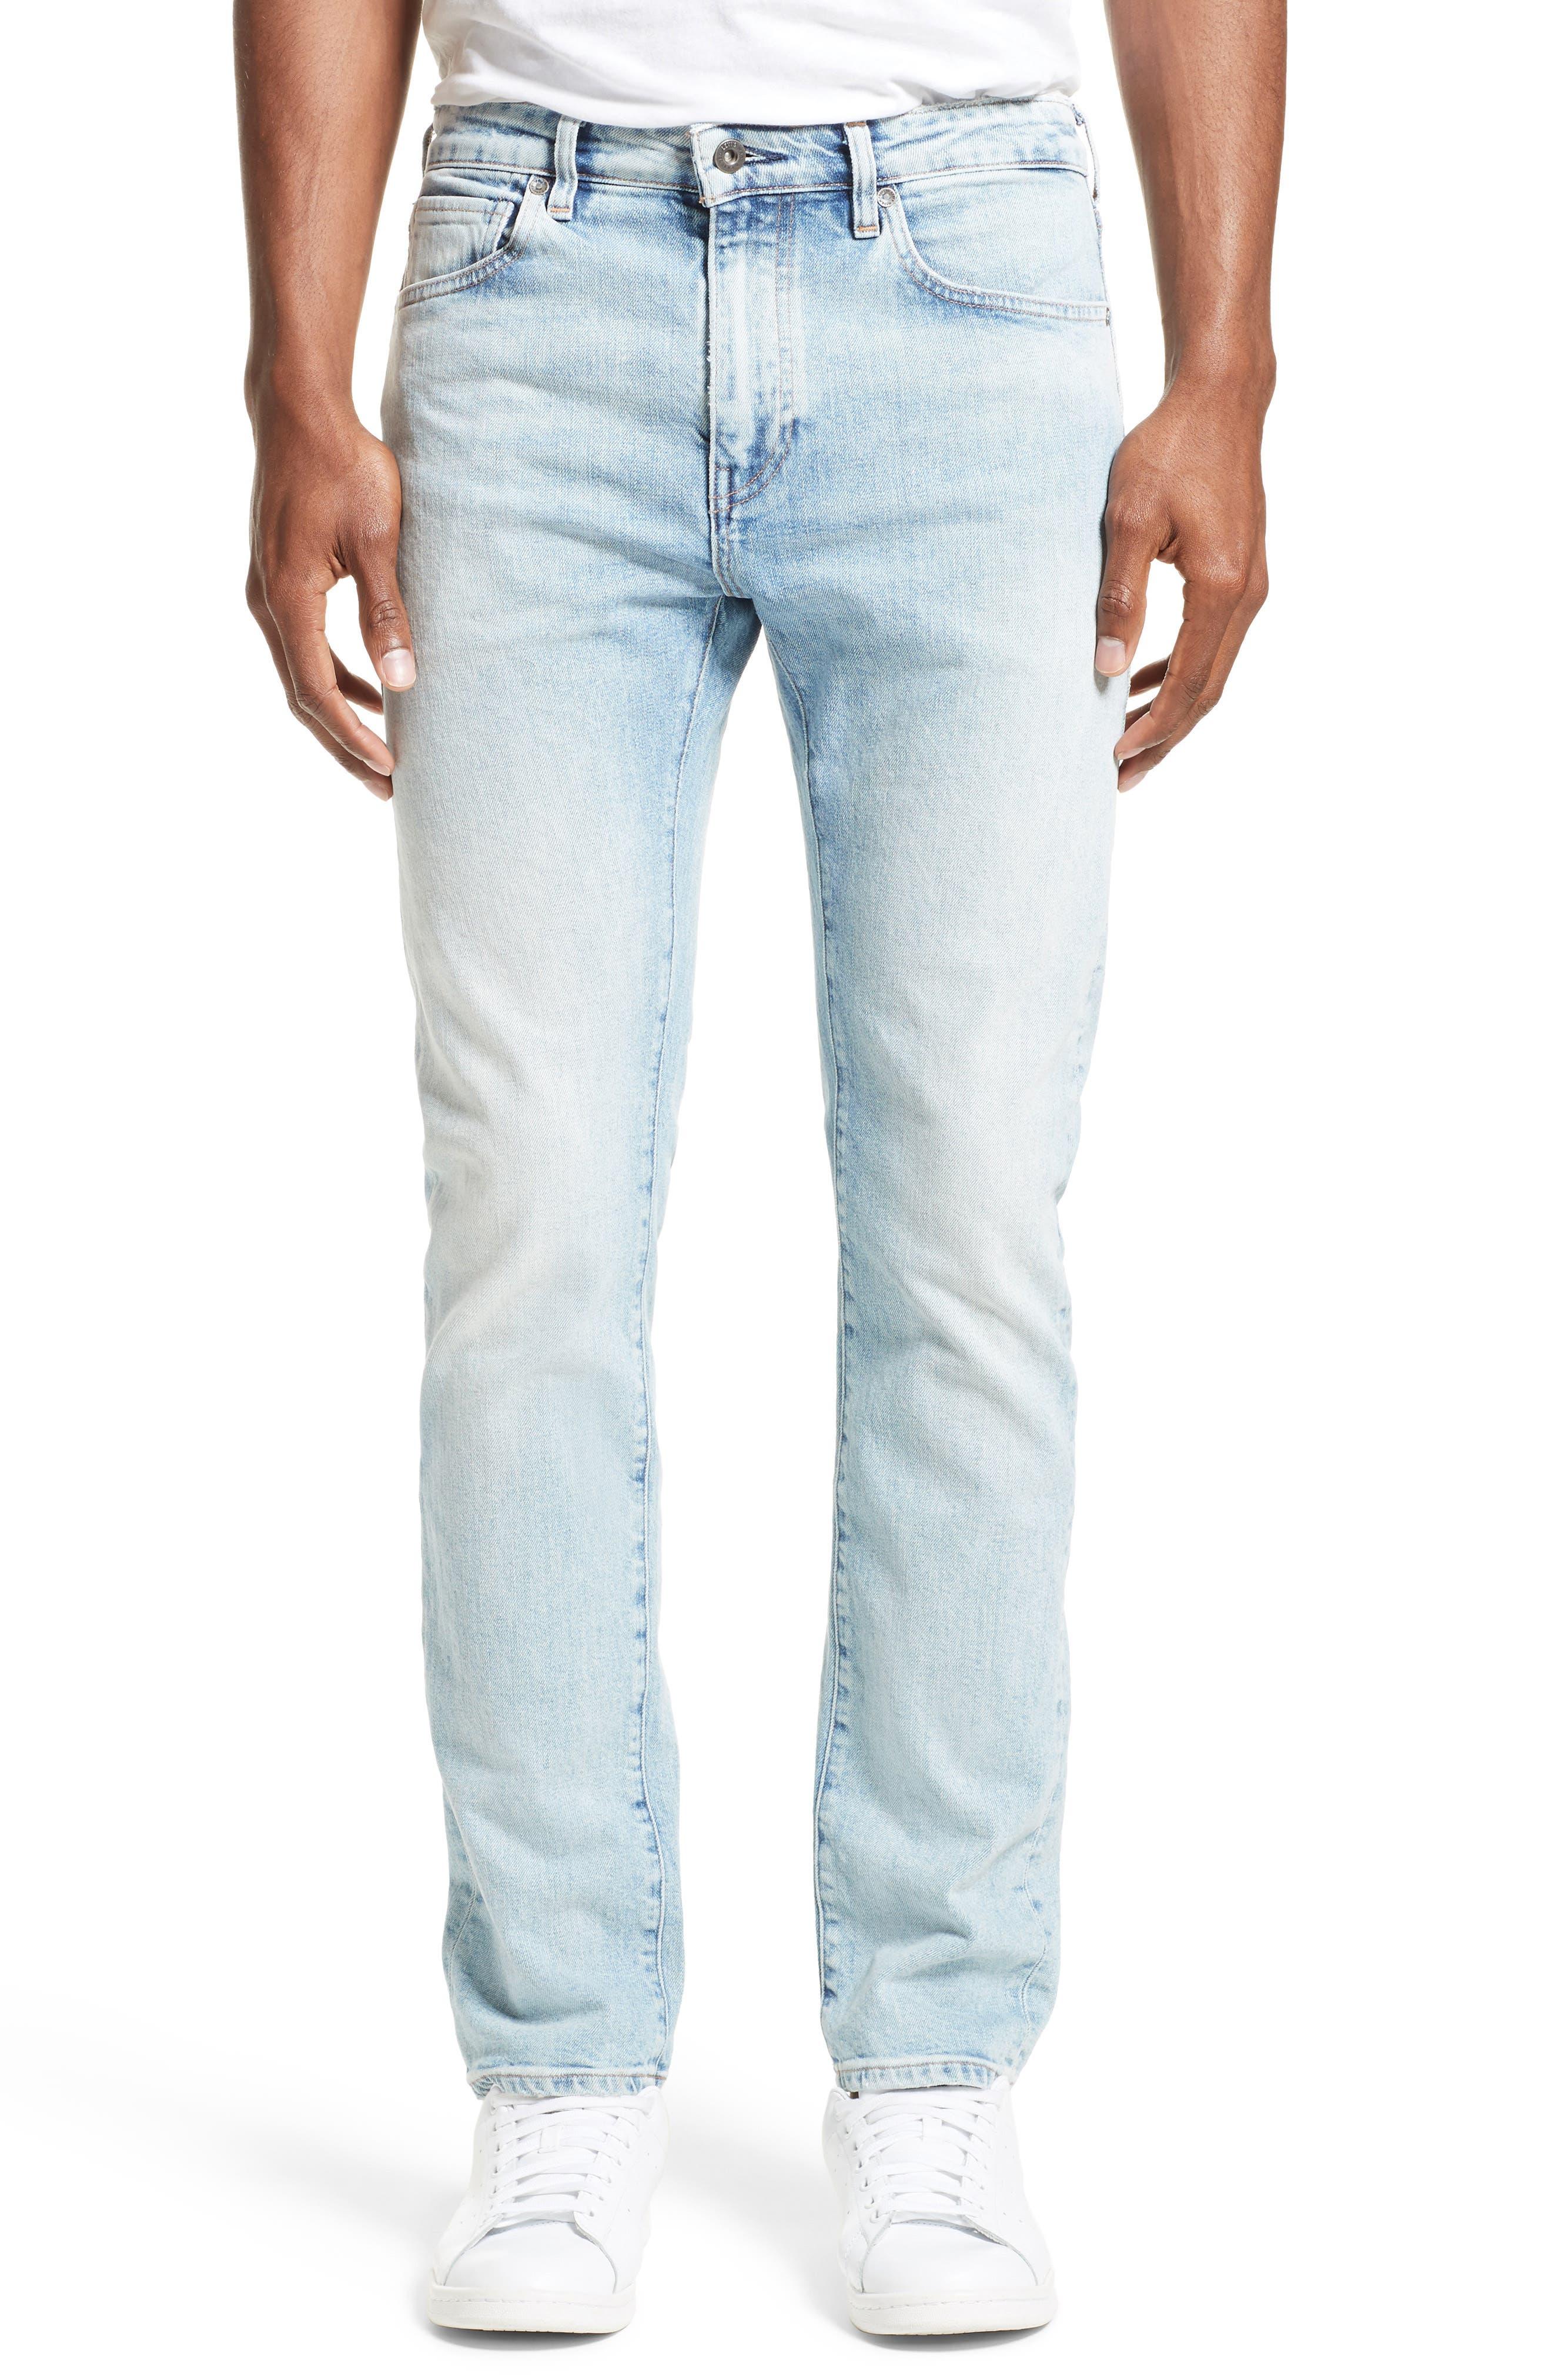 Tack Slim Fit Jeans,                         Main,                         color, Light Blue